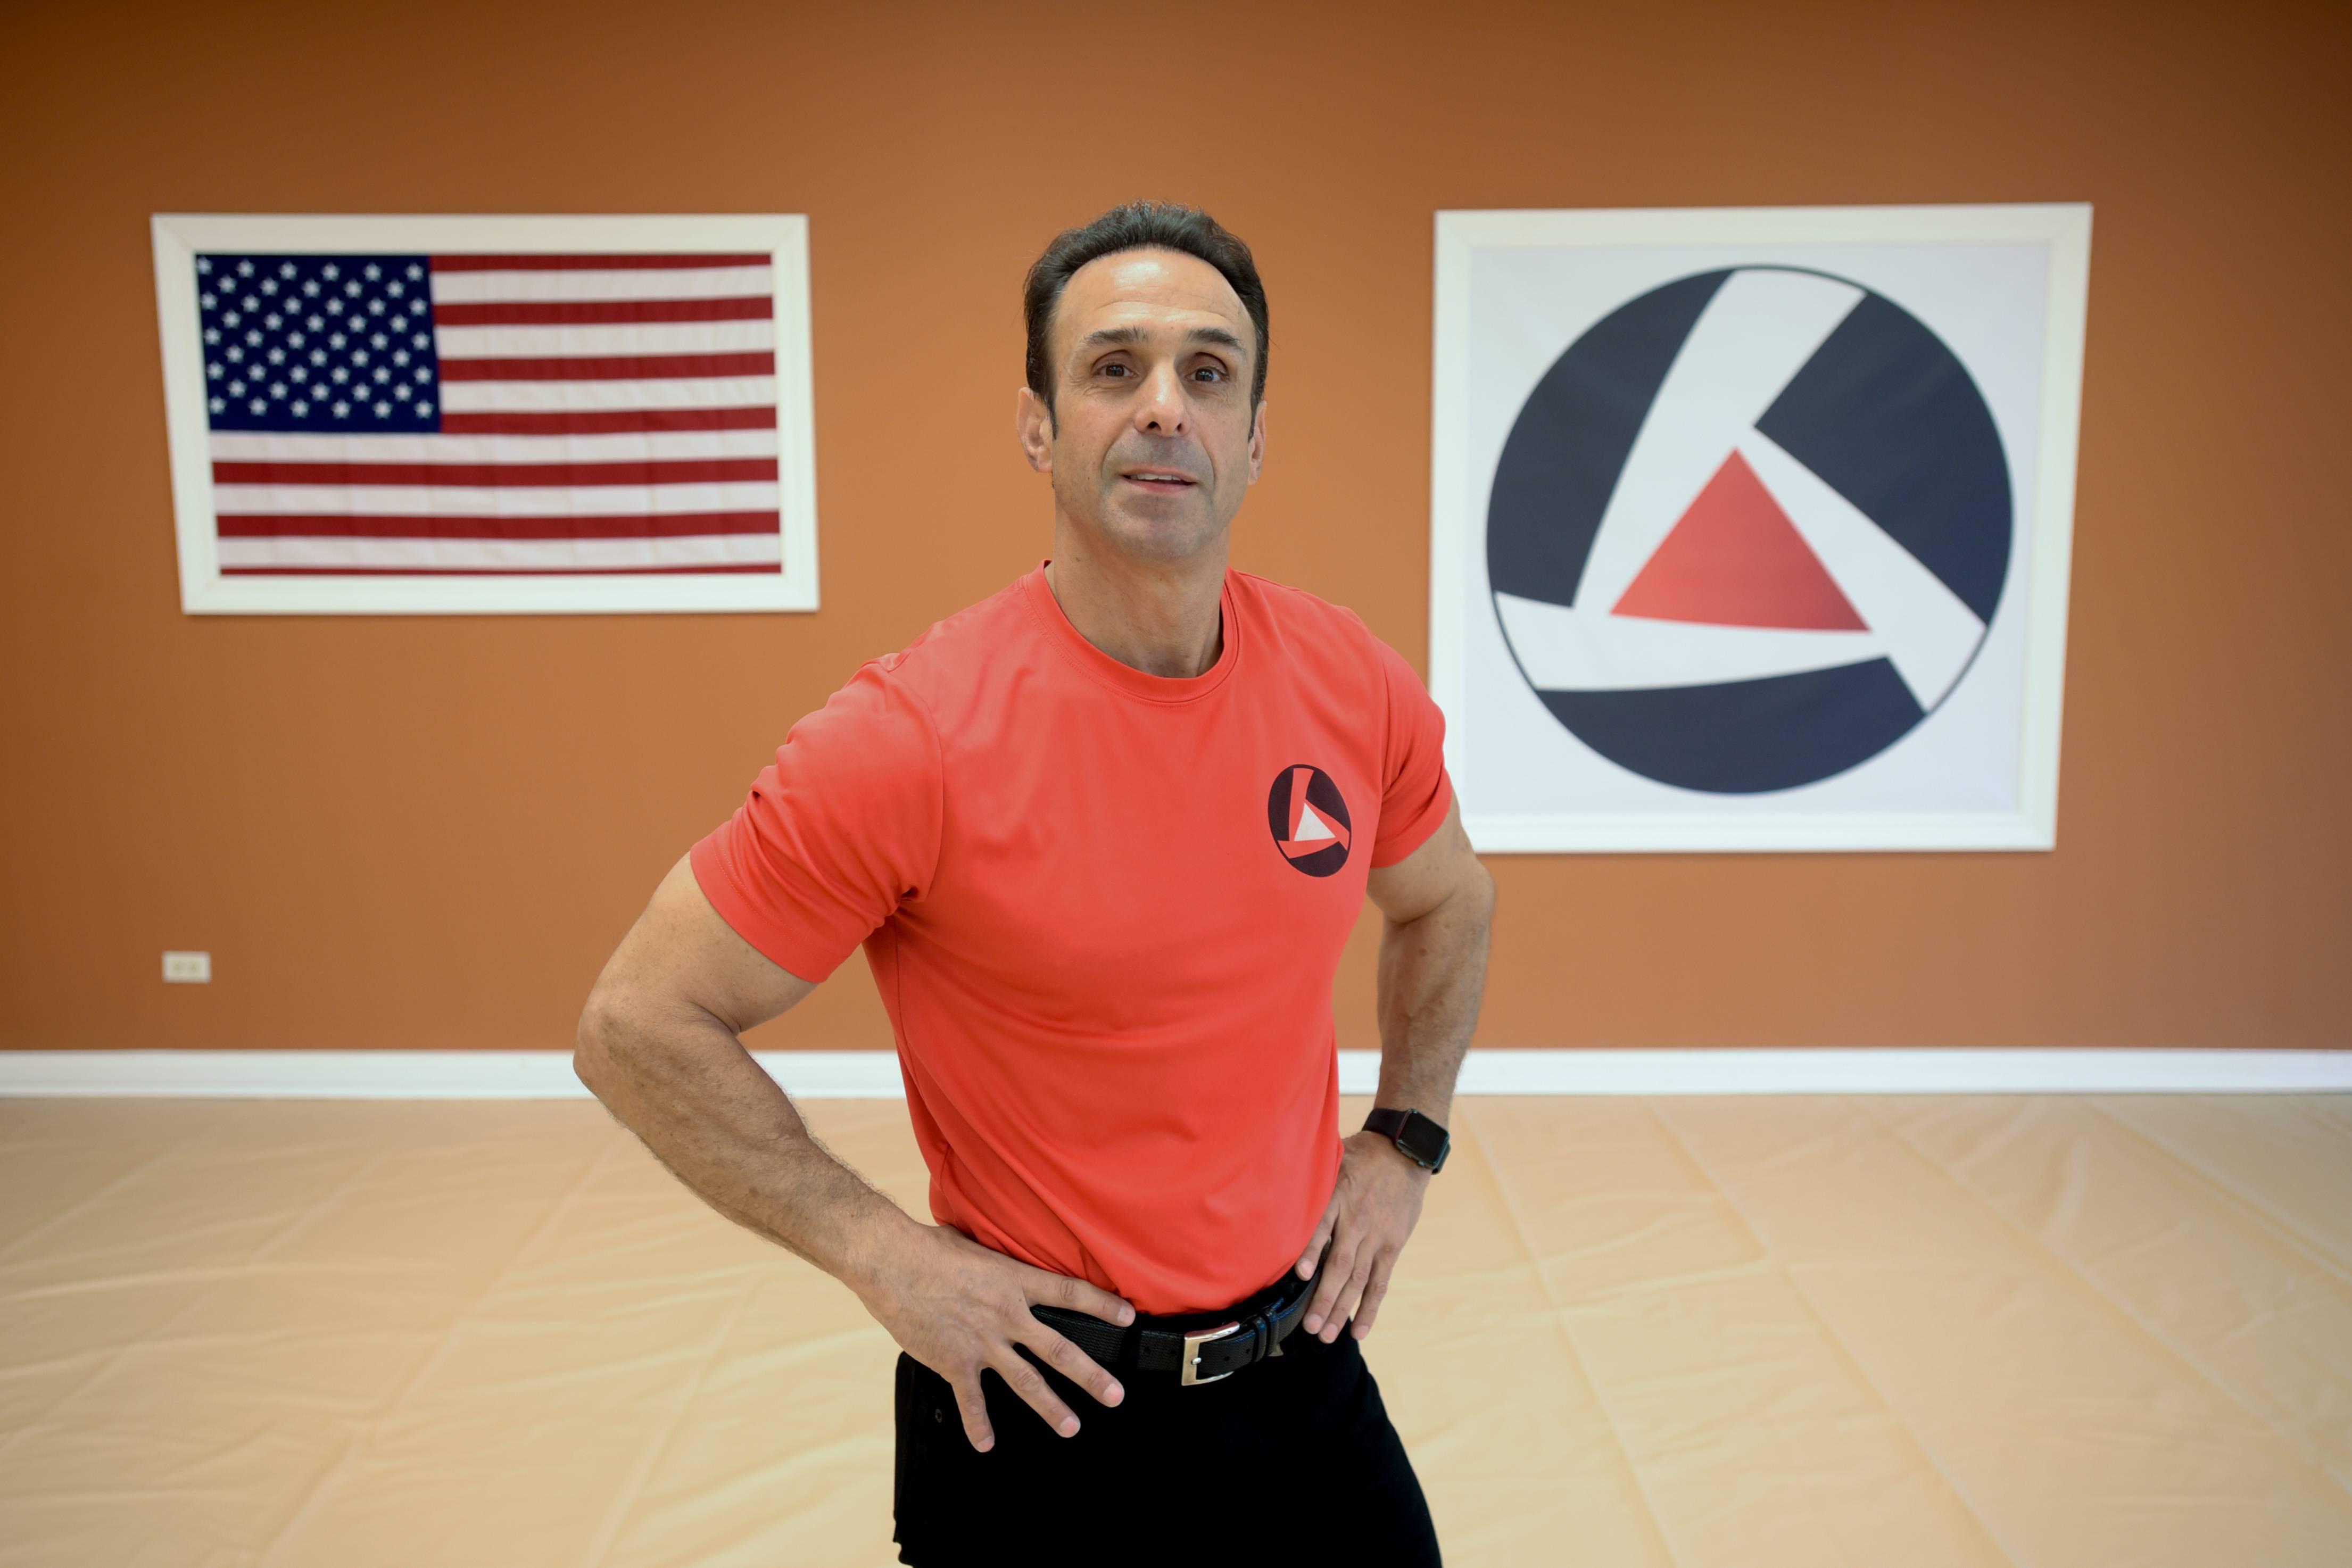 Naperville martial arts studio challenges kids to 'Strive'